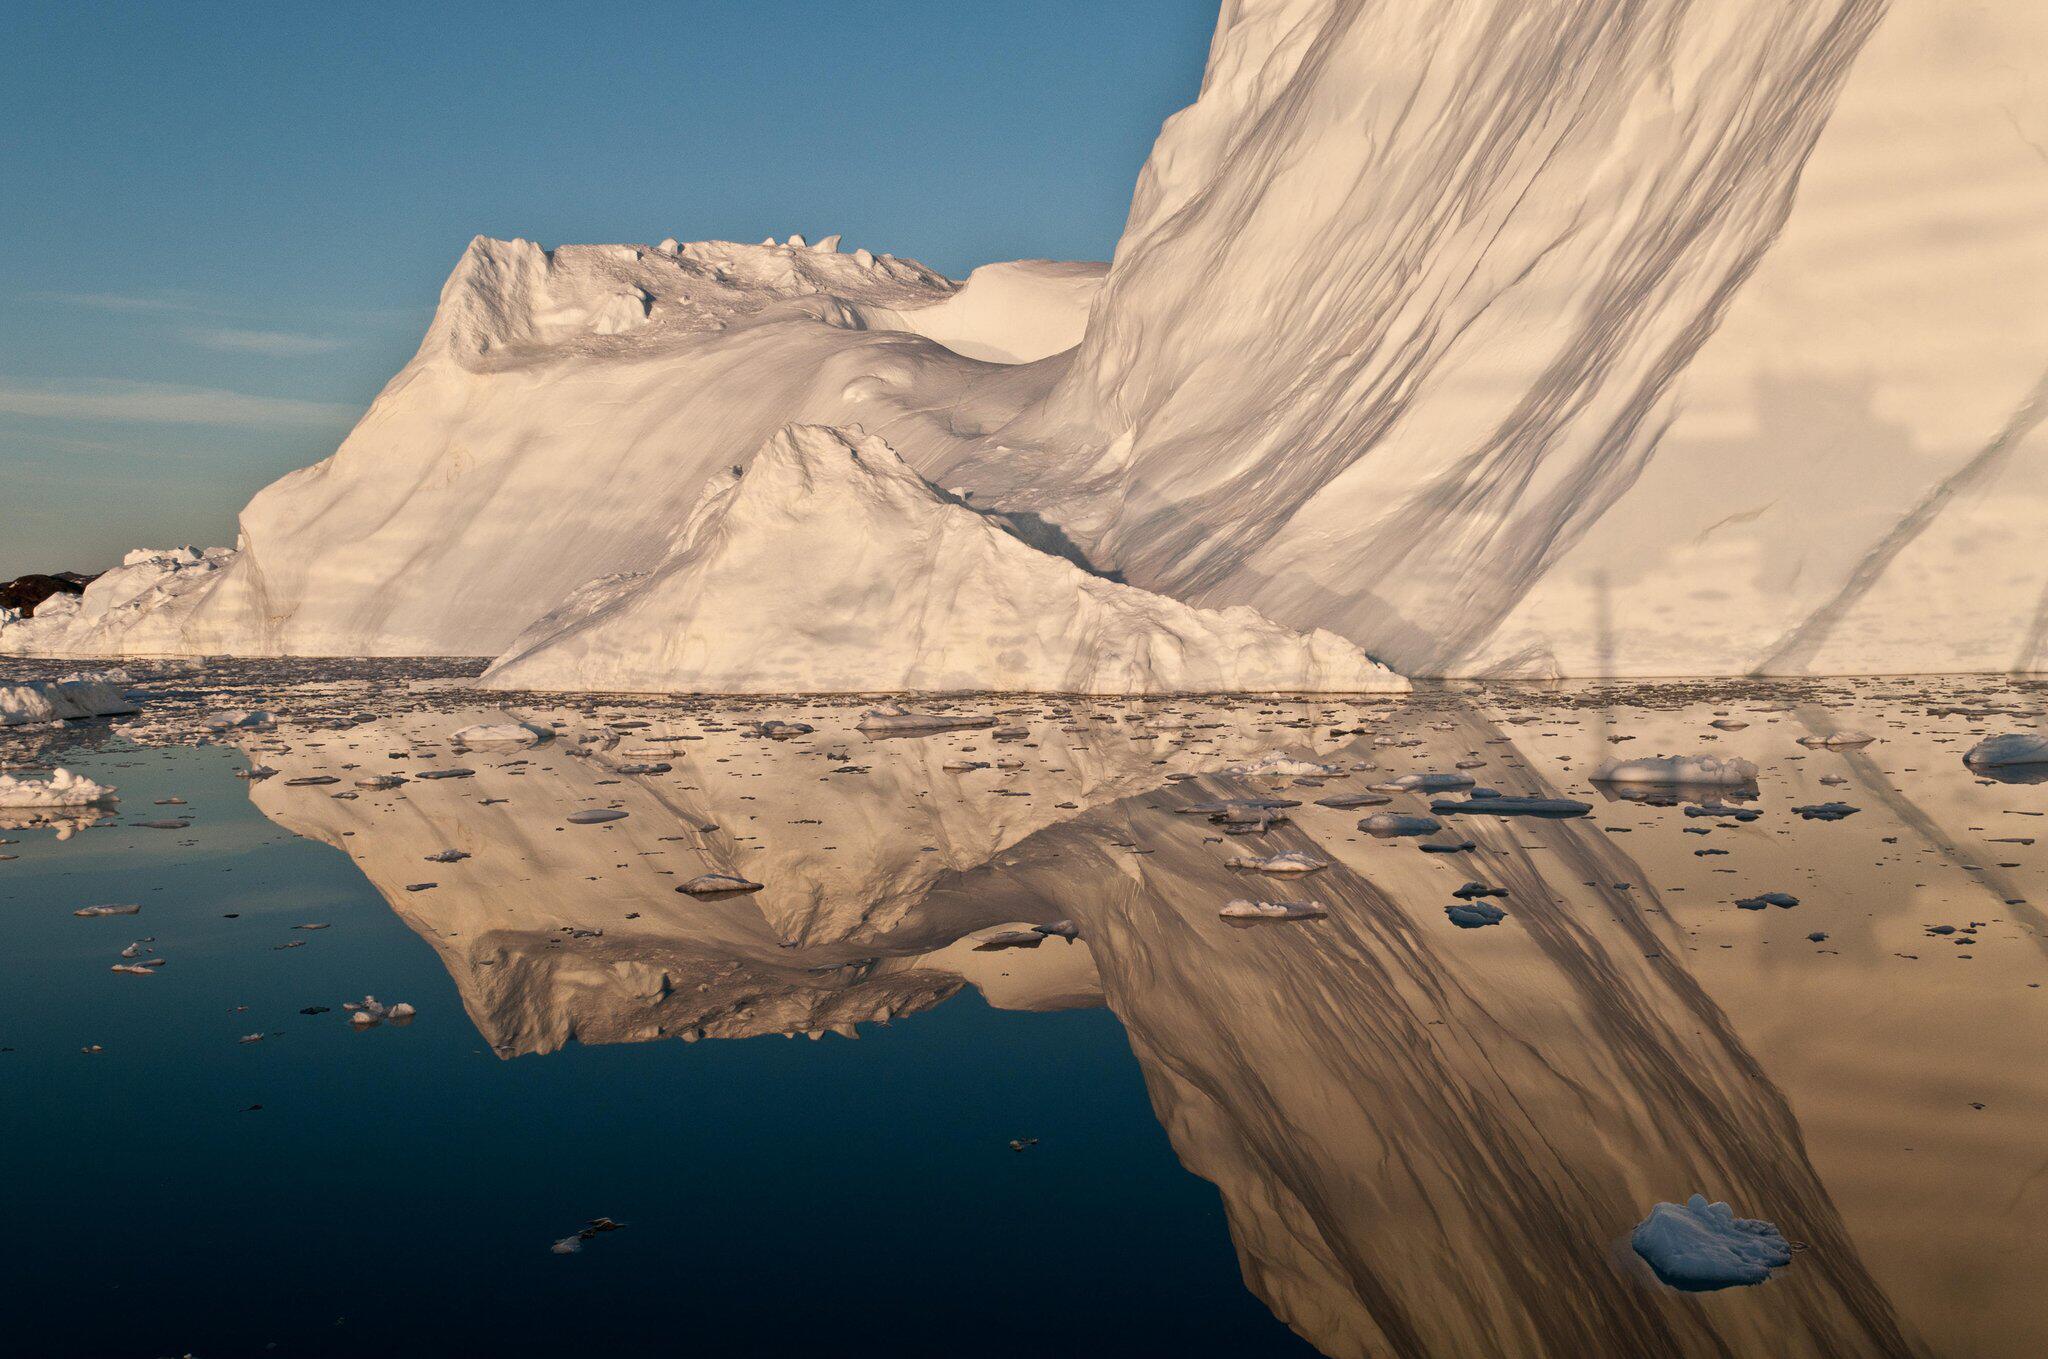 Bild zu Grönland-Eisschmelze hob Meeresspiegel um fast elf Millimeter an